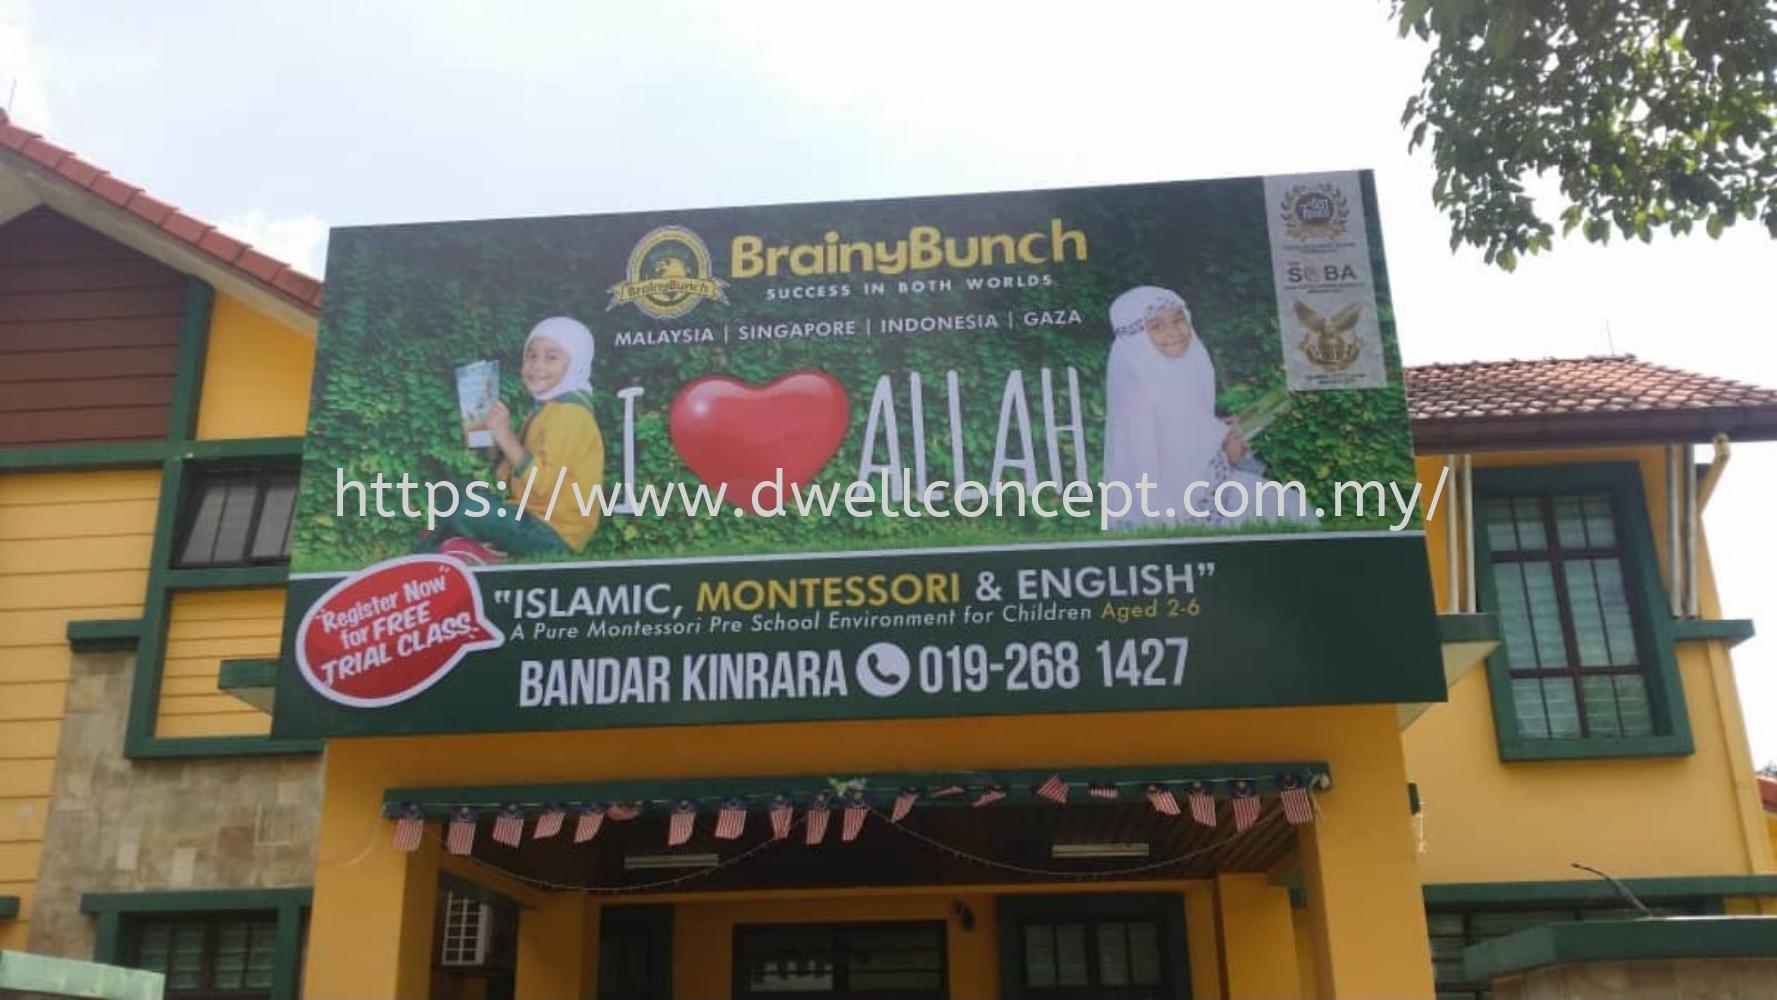 Billboard Billboard Klang, Selangor, Kuala Lumpur, KL, Malaysia